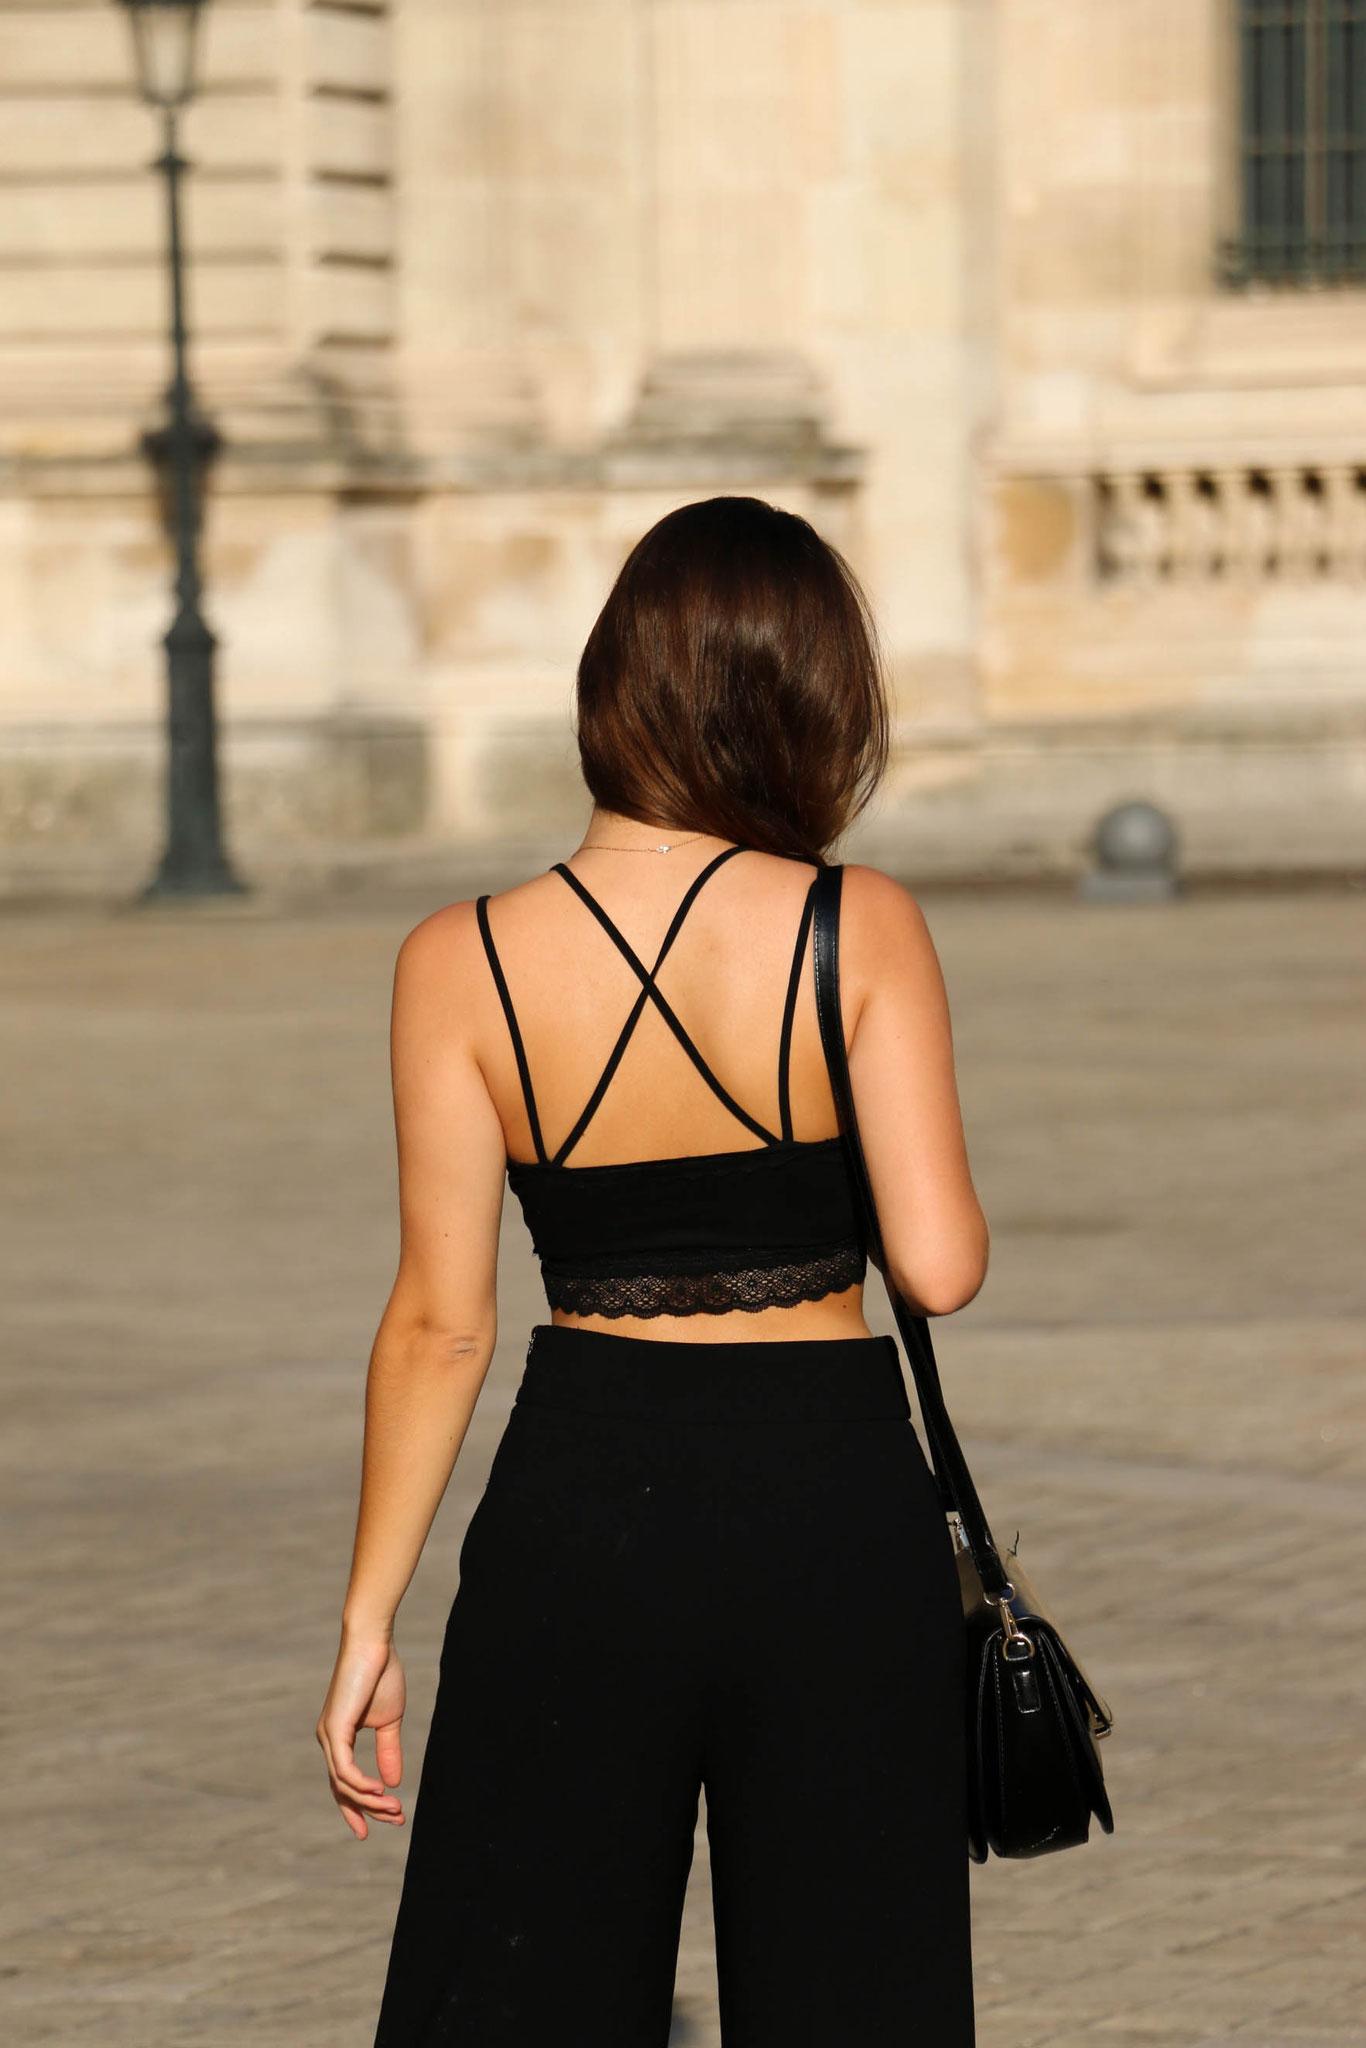 Black outfit, Paris, Louvre, Carmen Schubert